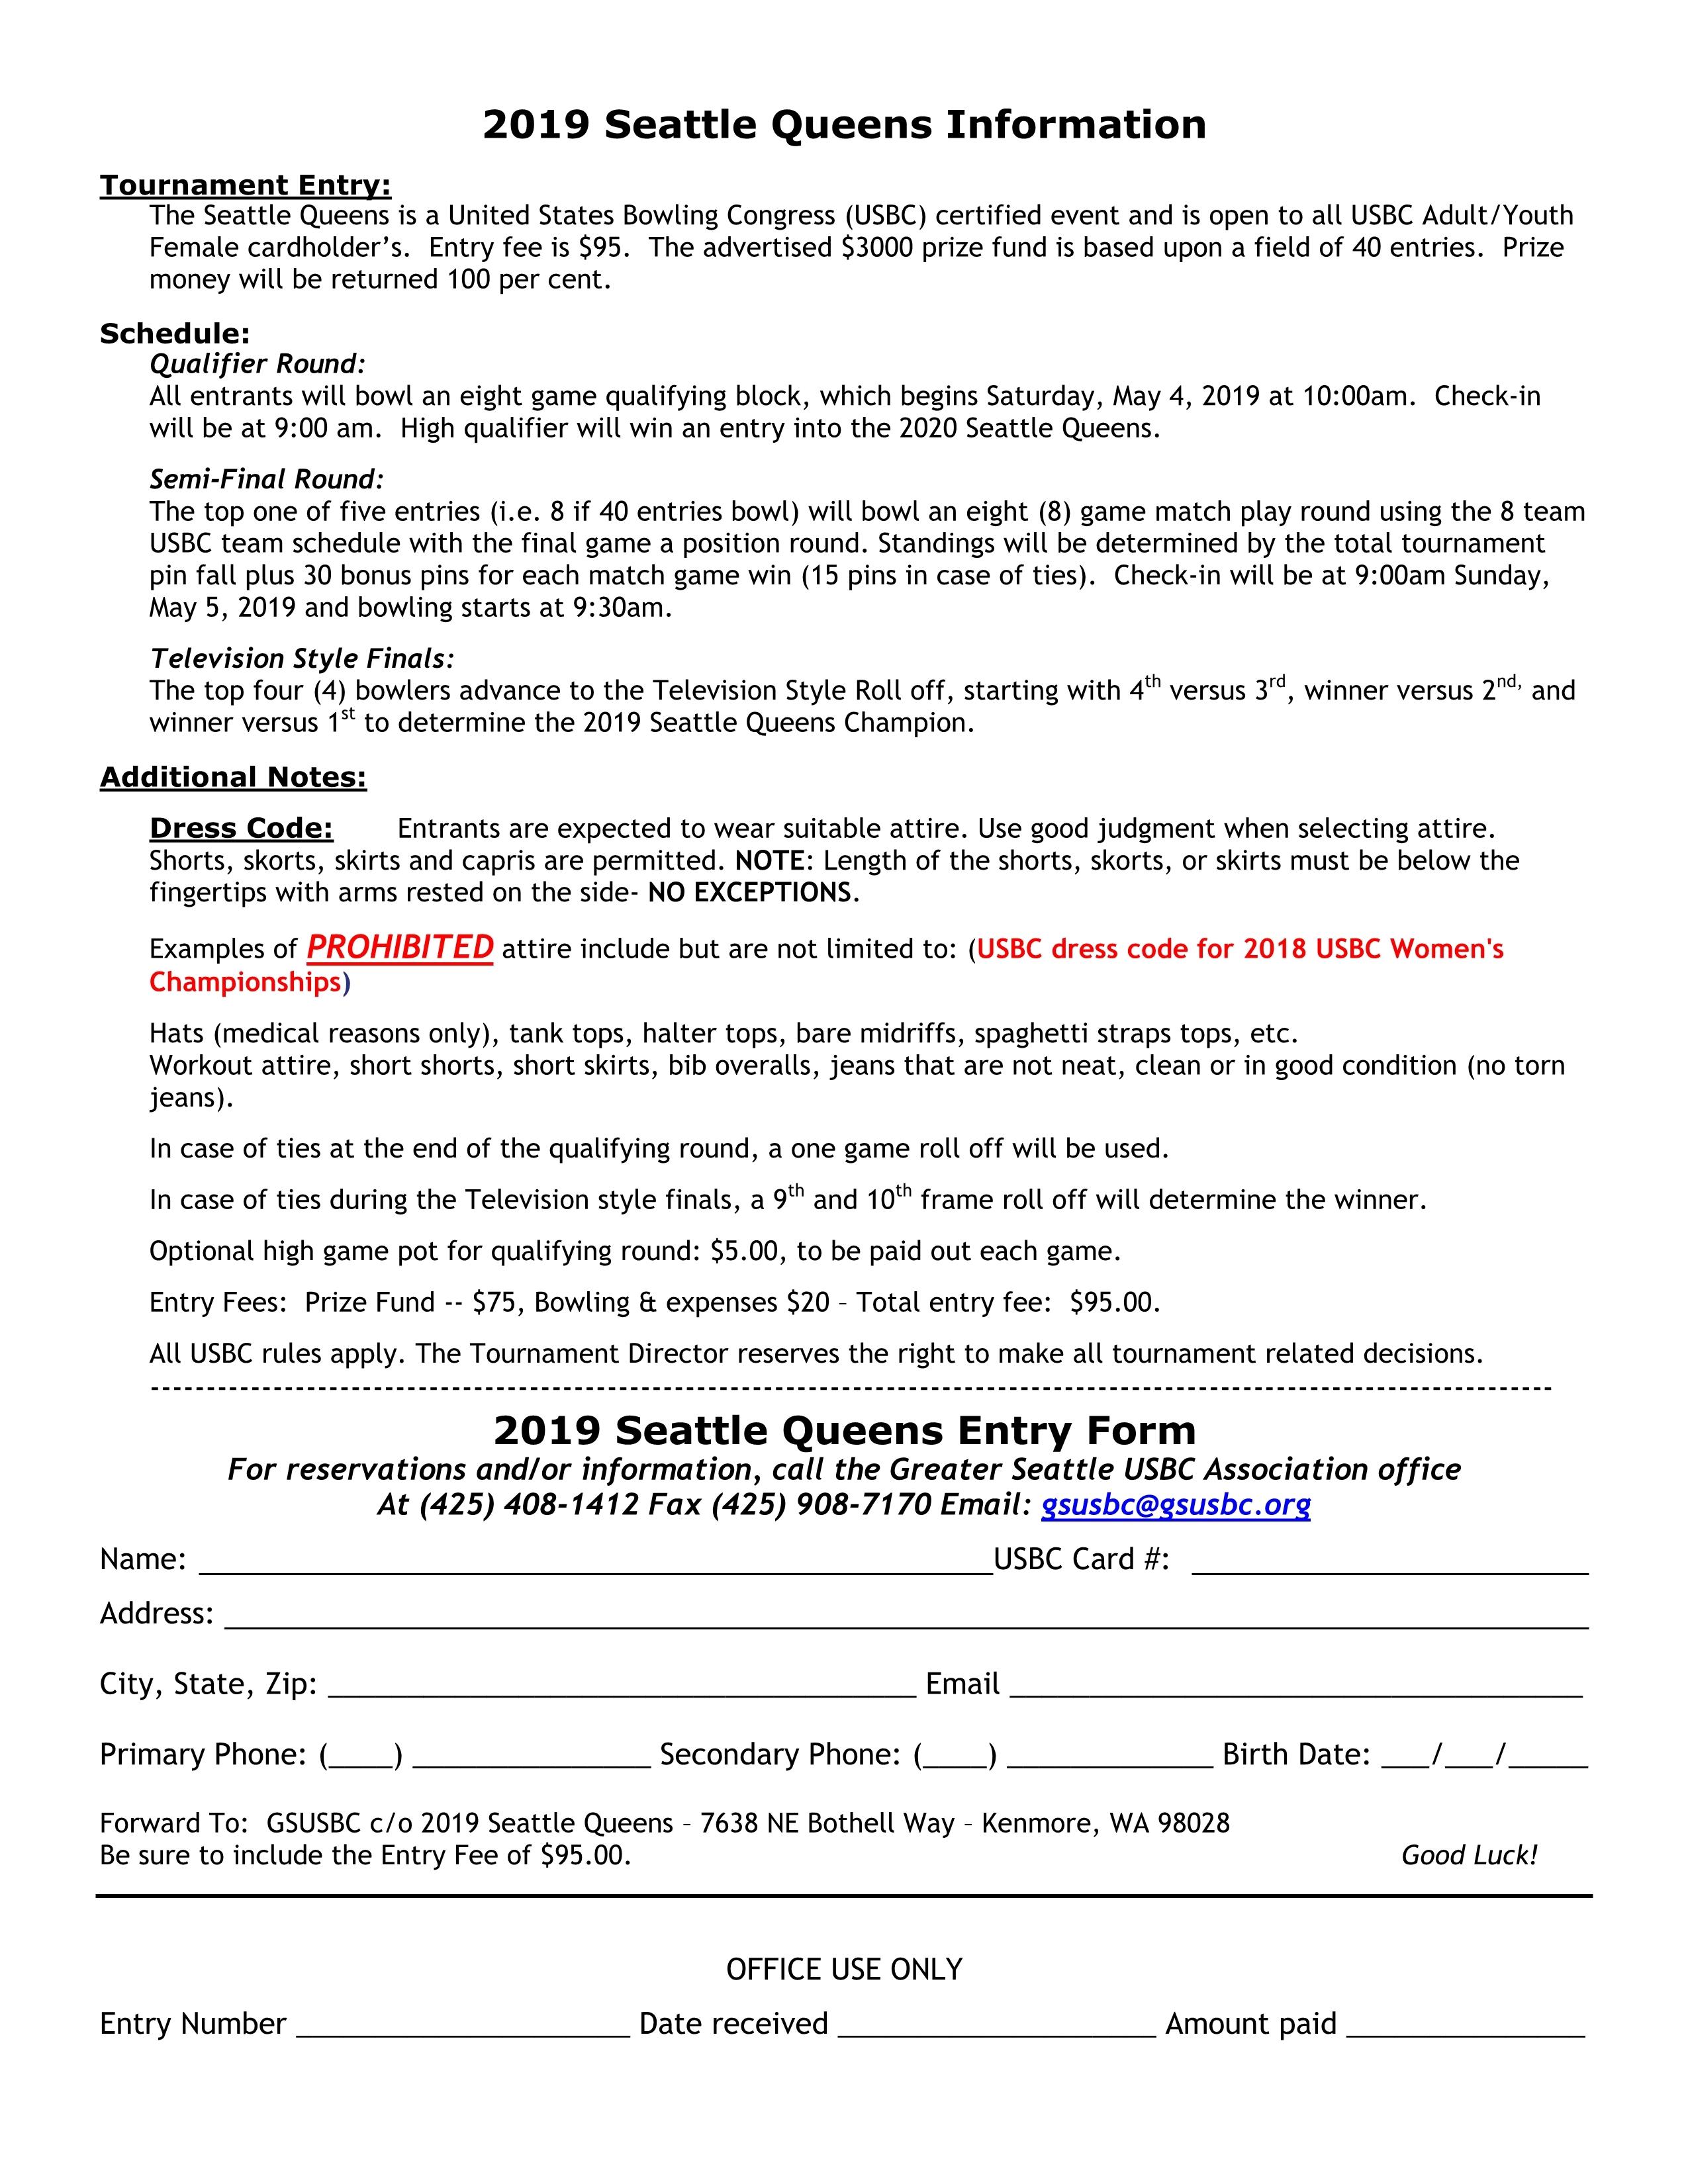 Seattle Queens Tournament